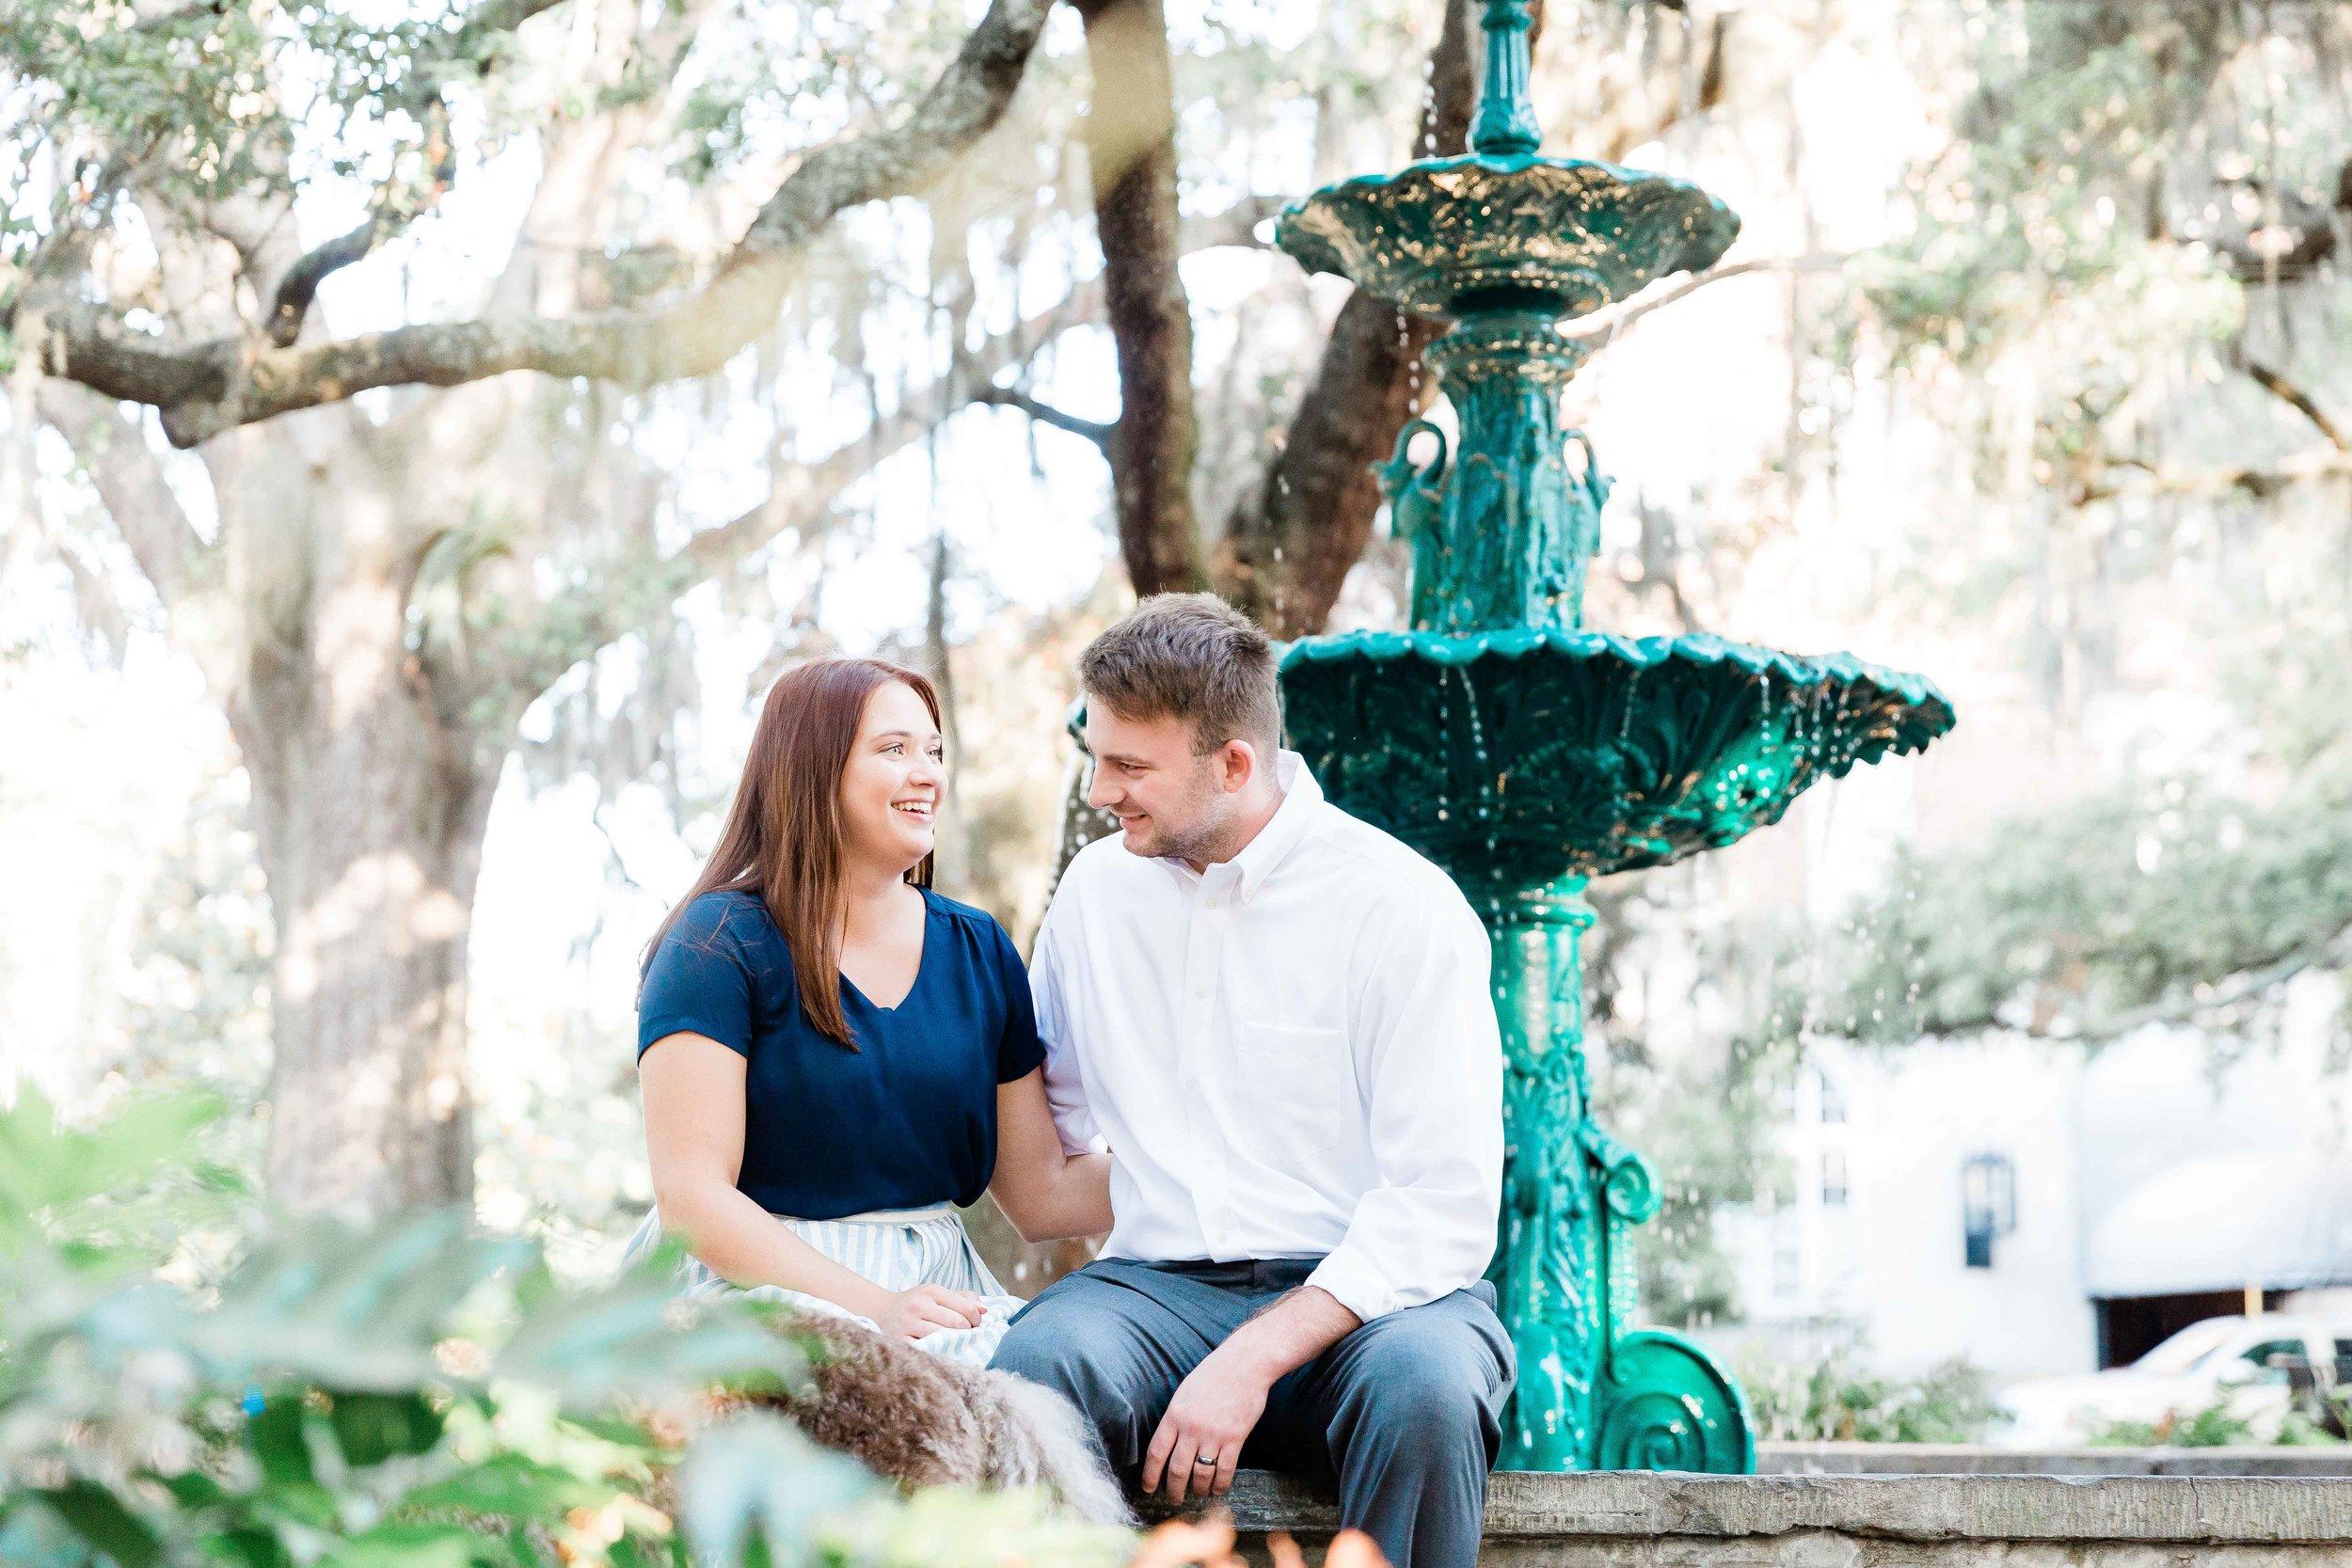 20190519Georgia-Savannah-Kristen & Zach-Forsyth Park-Lafayette Square18.jpg